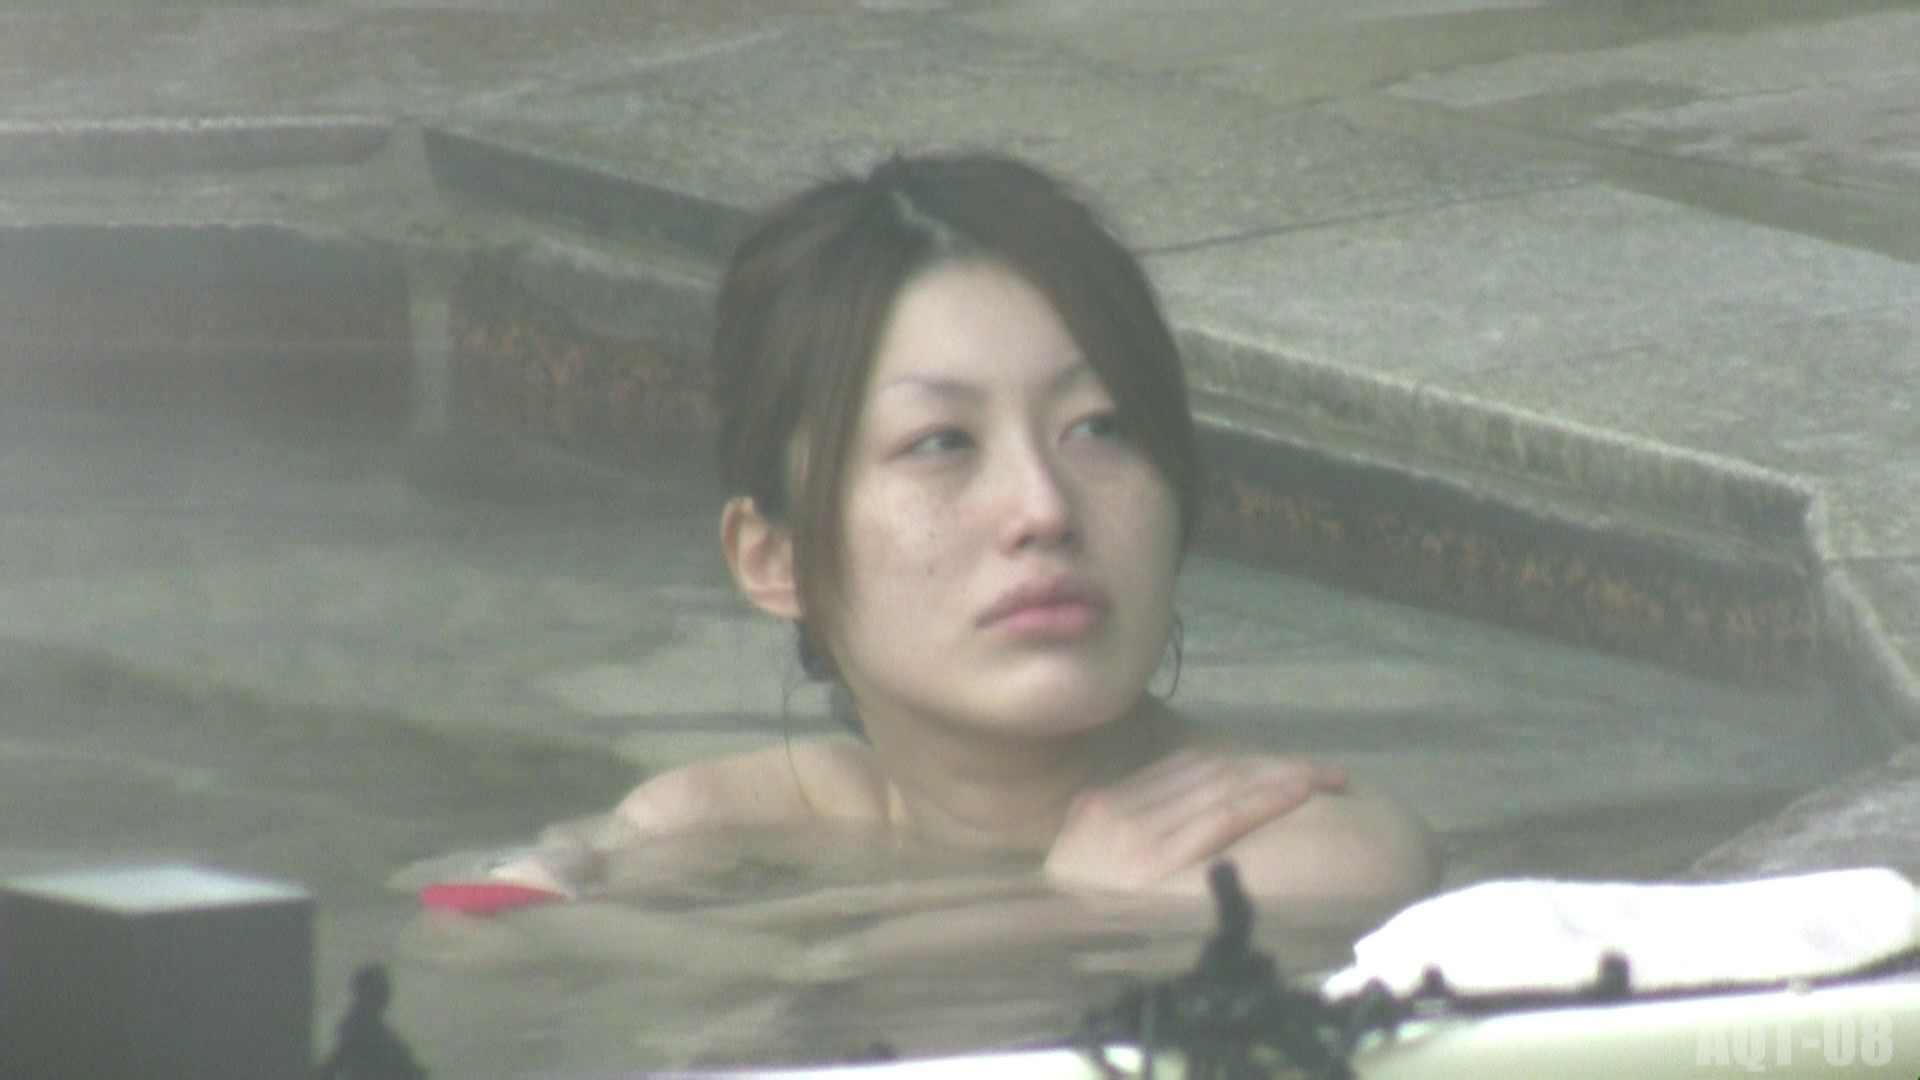 Aquaな露天風呂Vol.775 盗撮師作品 AV無料動画キャプチャ 98pic 35